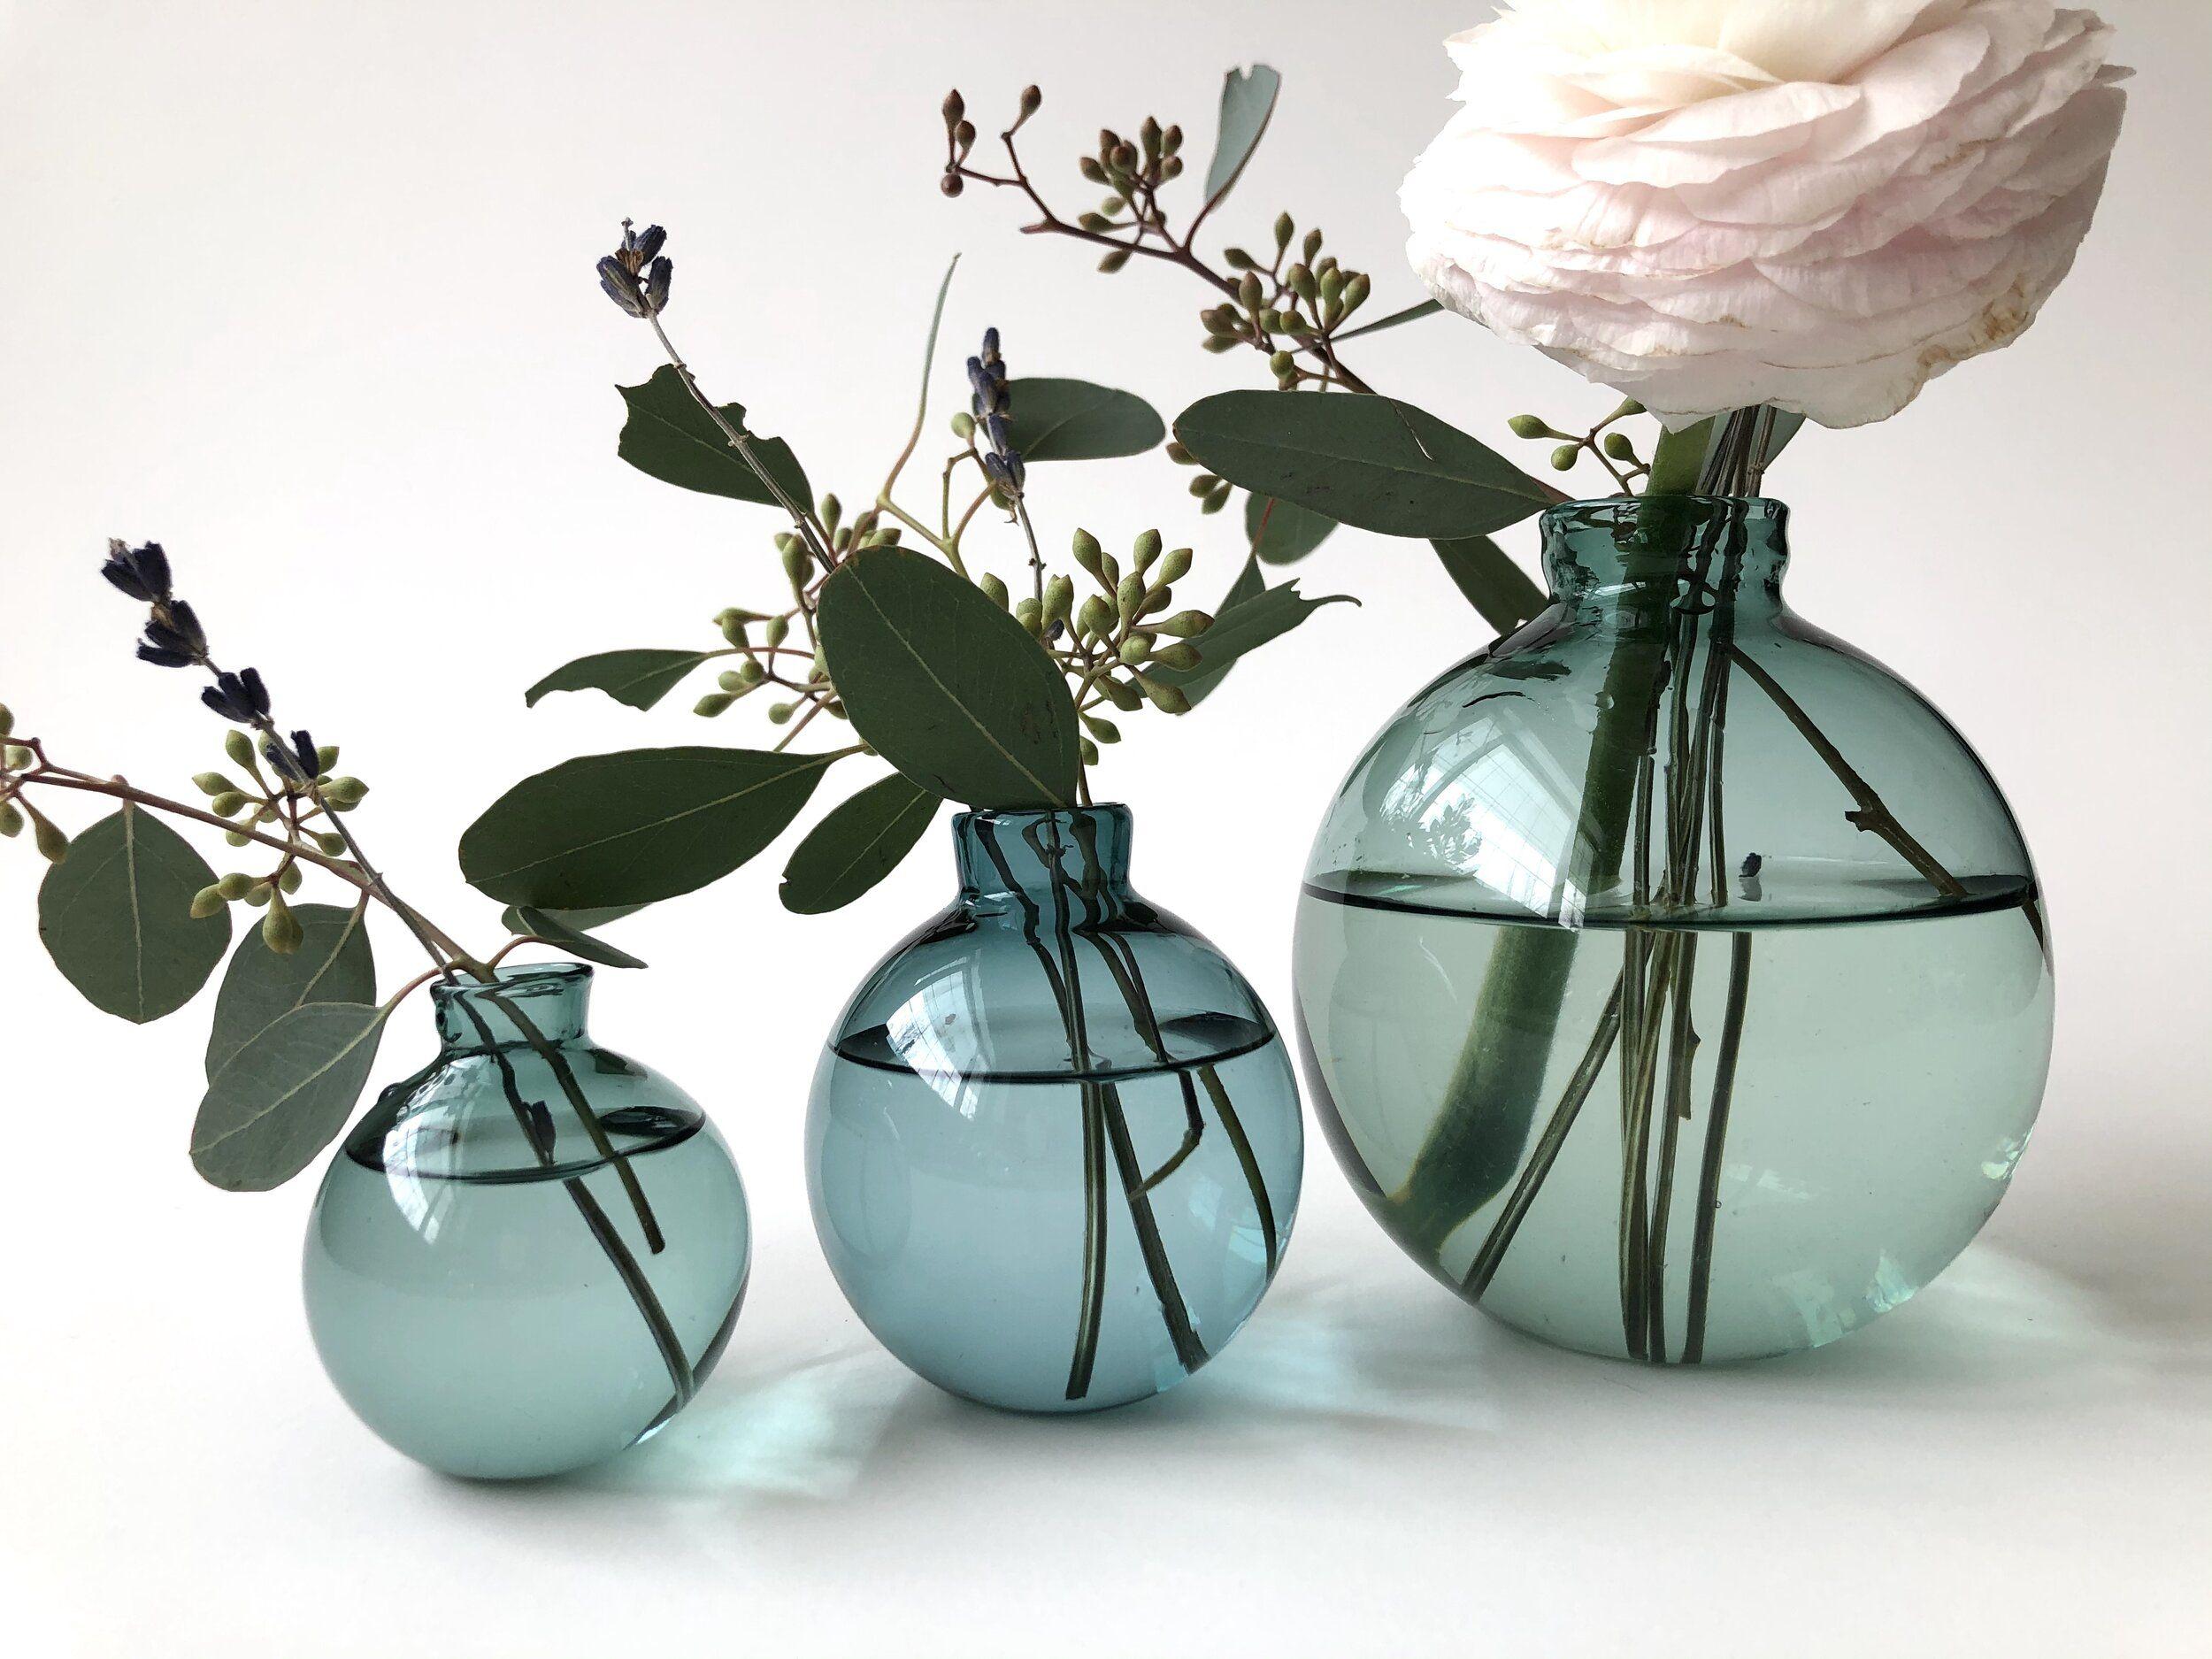 Lake Green Bud Vases (Set of 3)